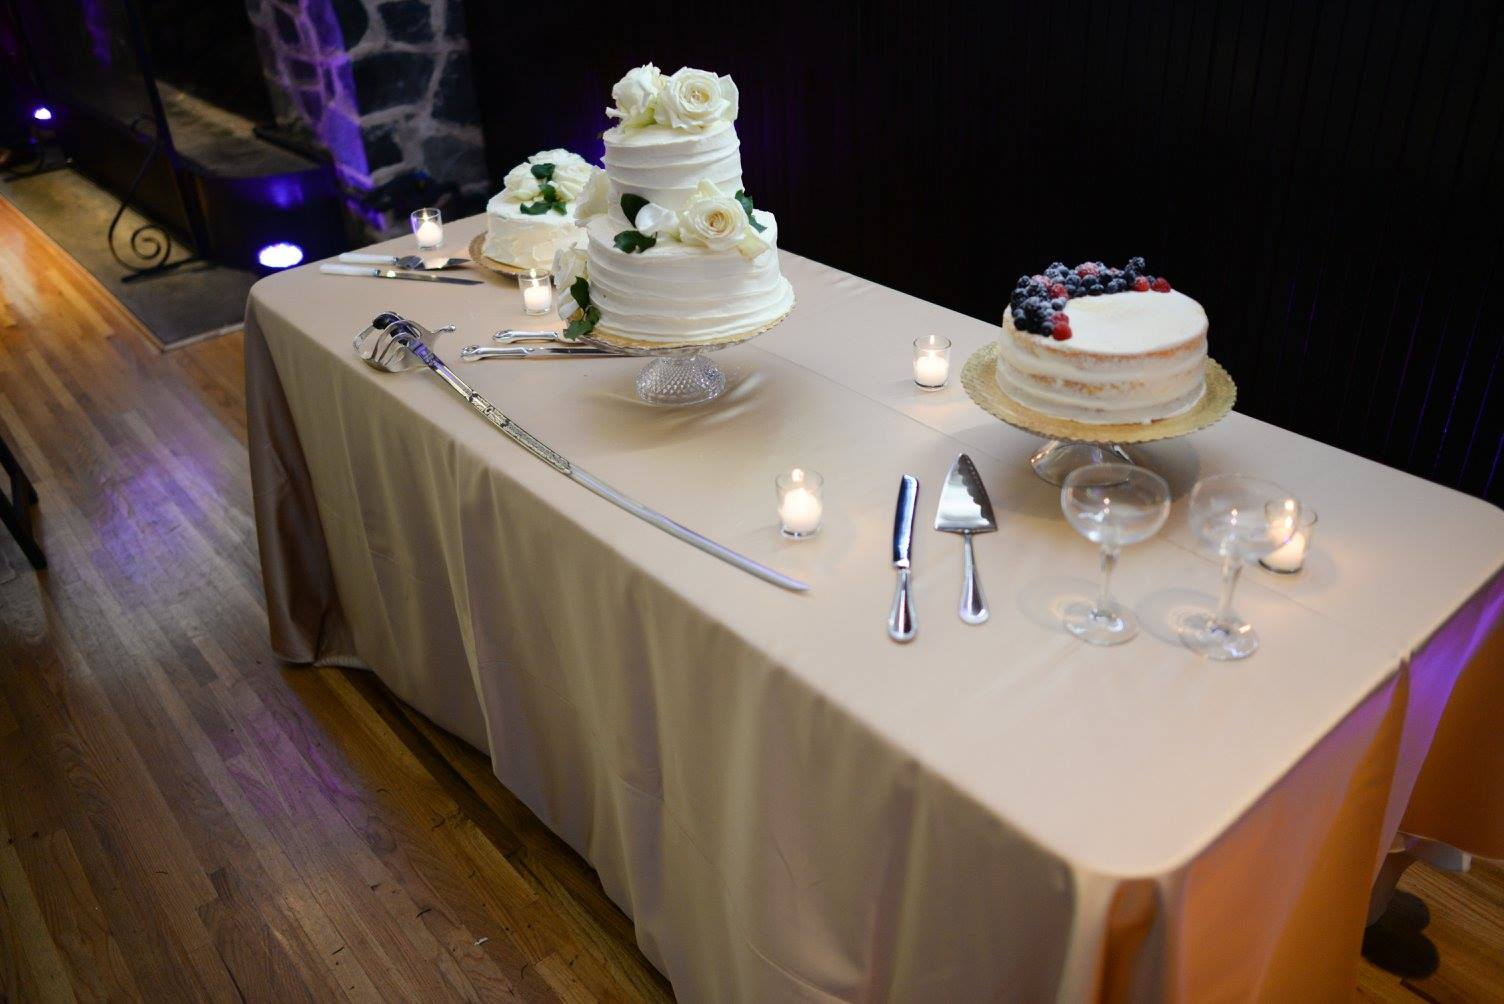 wedding cakes setup from Whole Foods